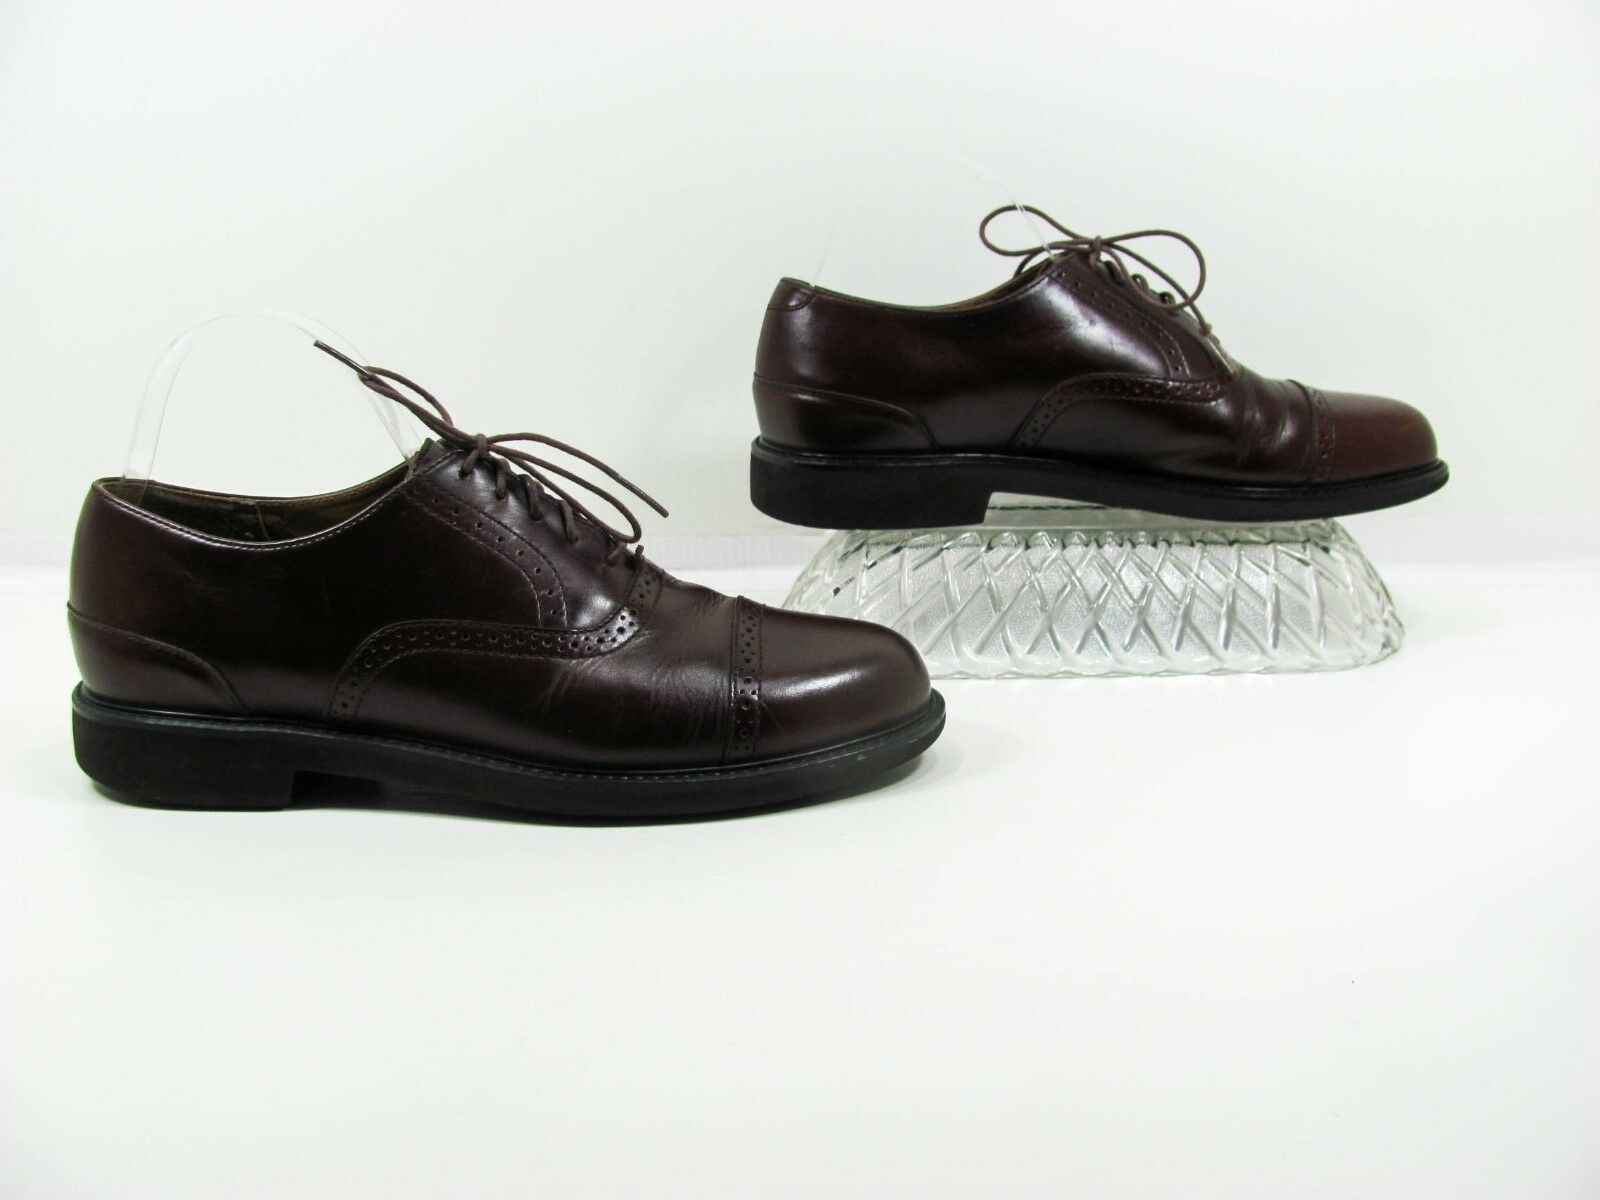 Rockport Men Brown Derby Cap Toe Oxford shoes Size 8M EUR 41 Pre Owned